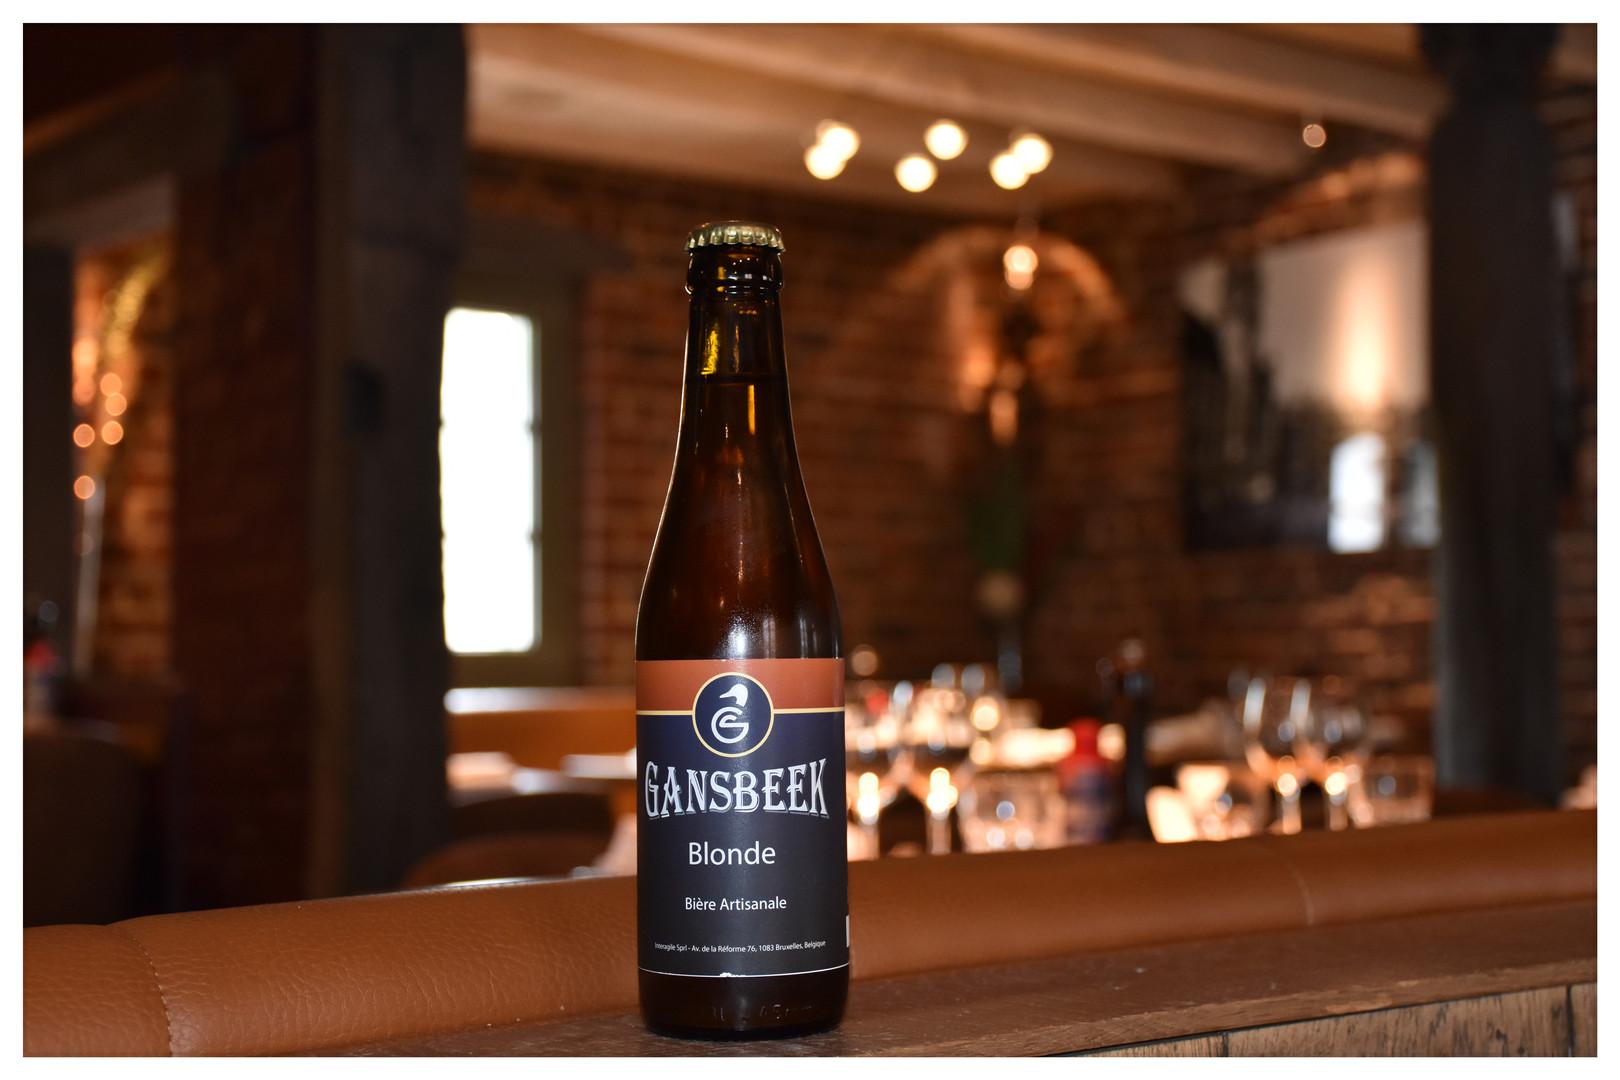 Gansbeek Blonde - Bière Artisanale